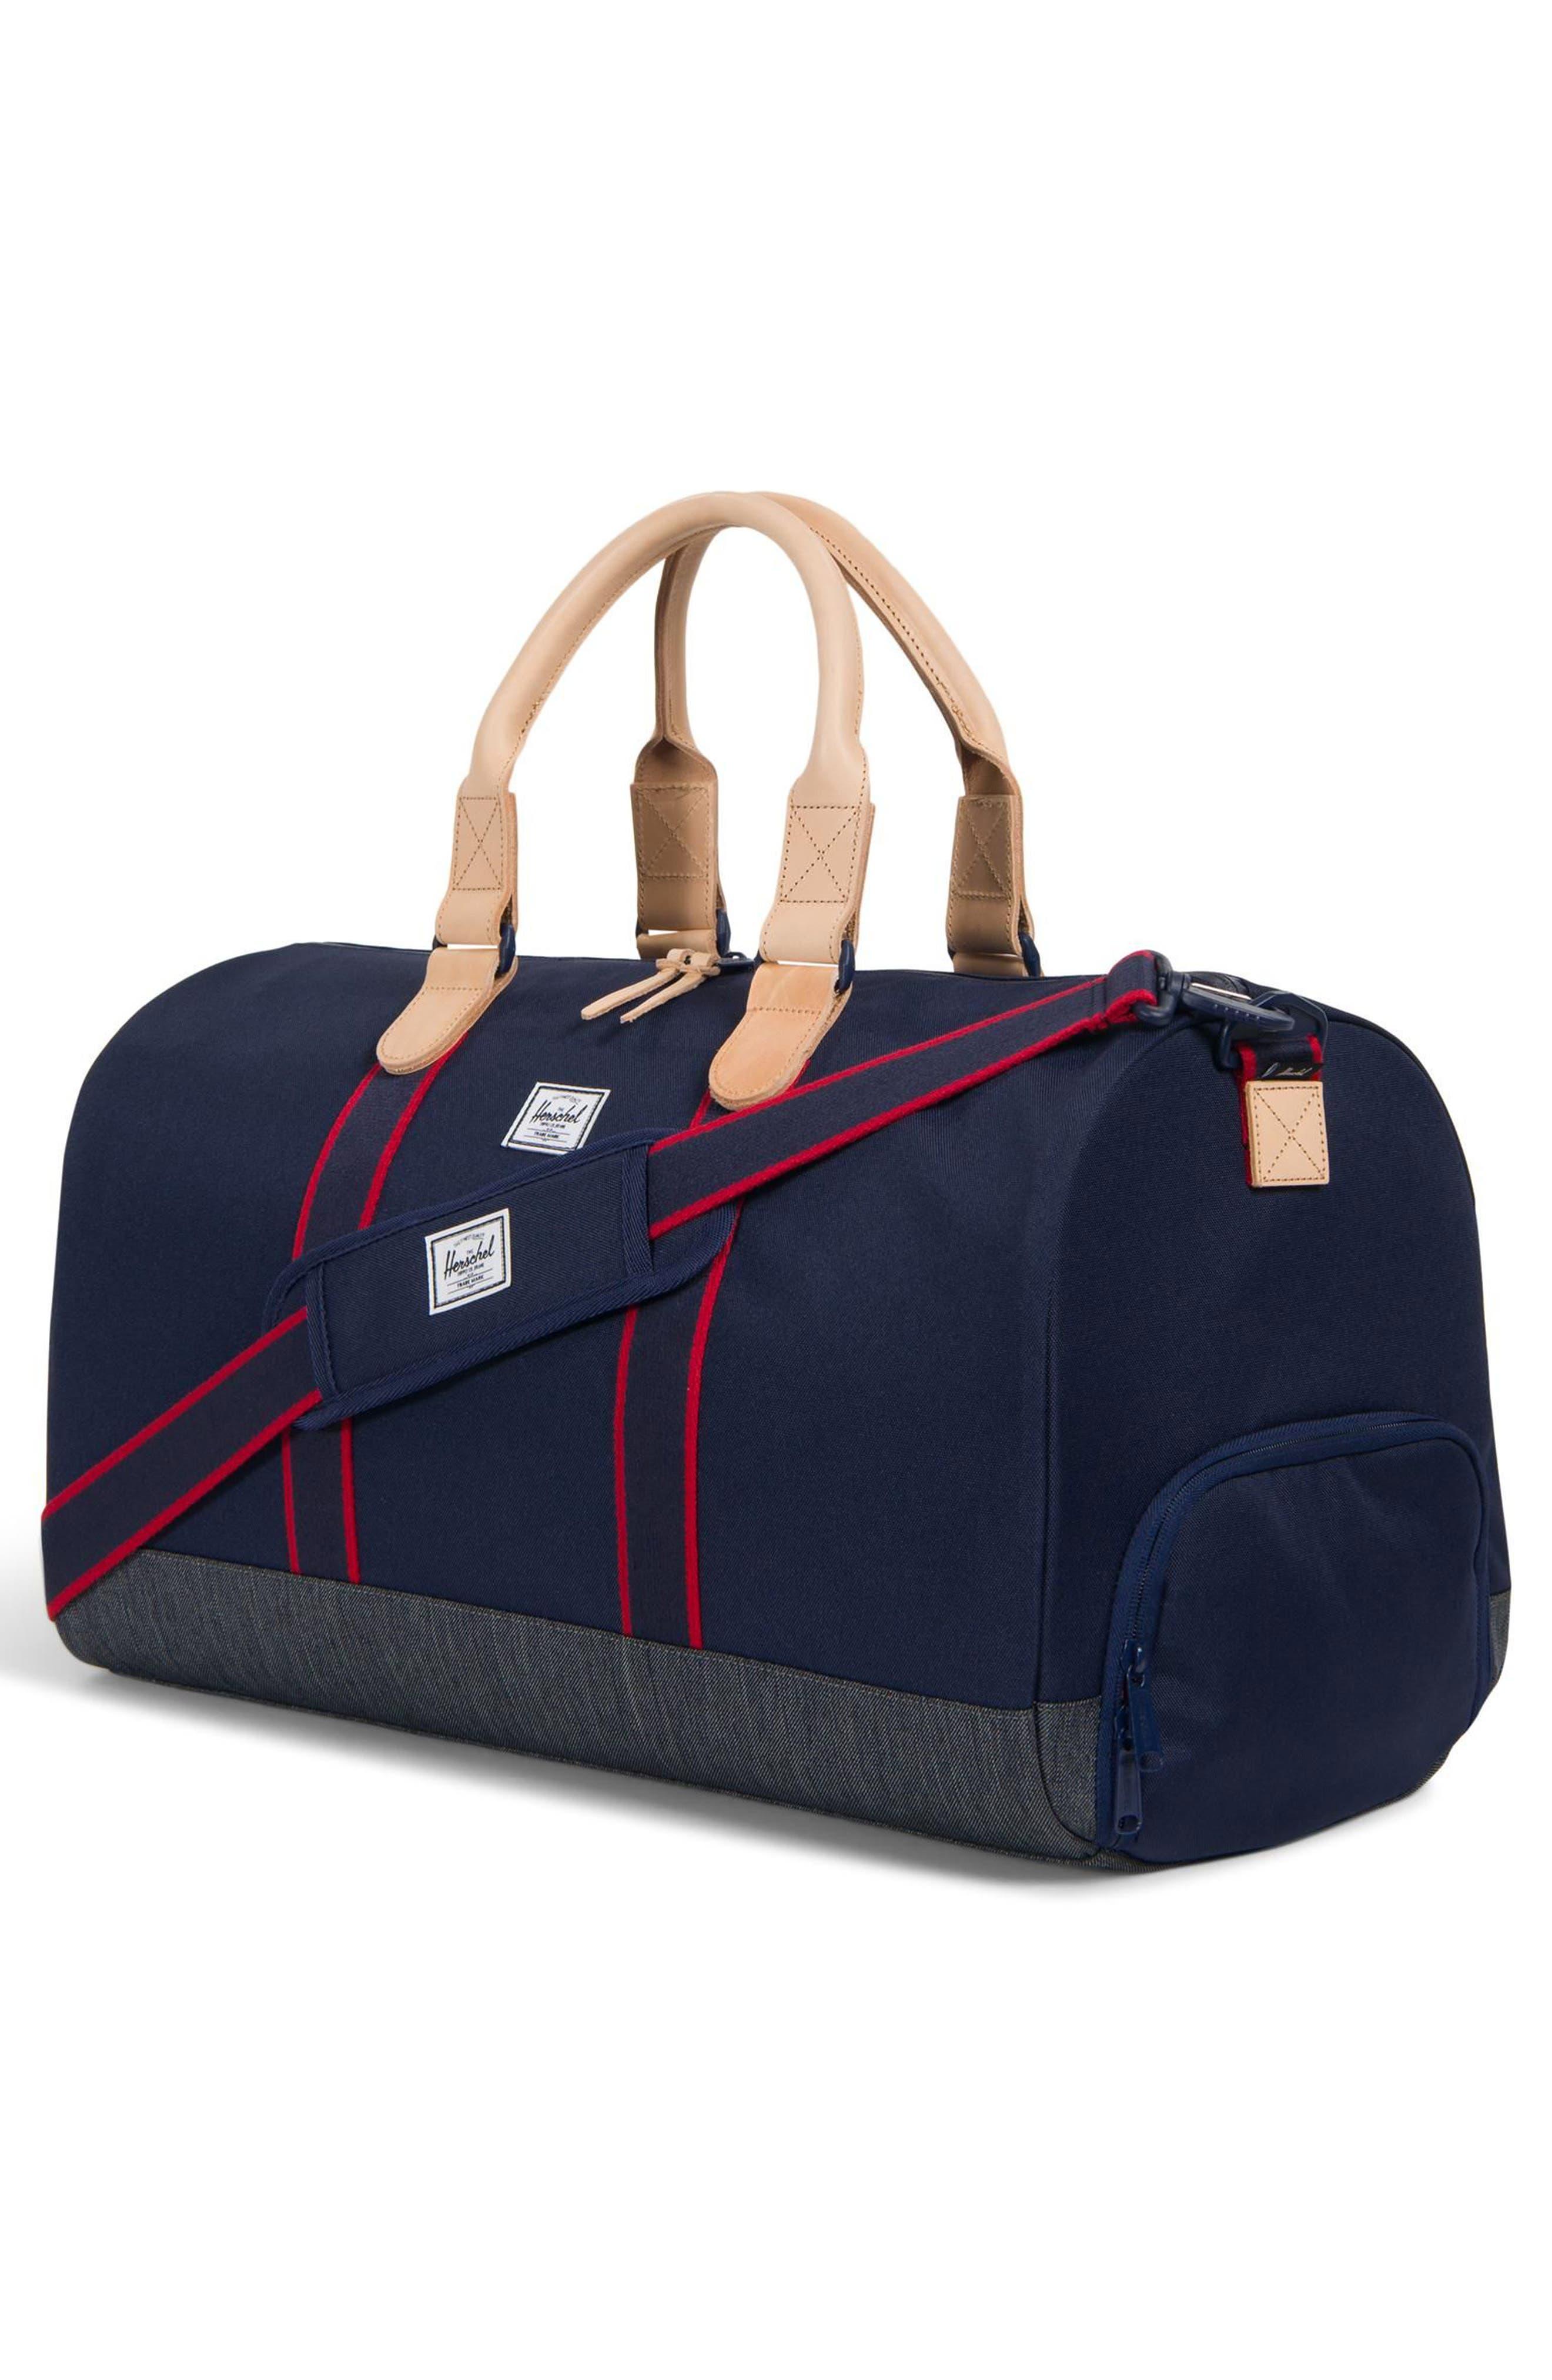 Duffel Bag Handbags   Accessories  Sale   Nordstrom a0aa8b0a92